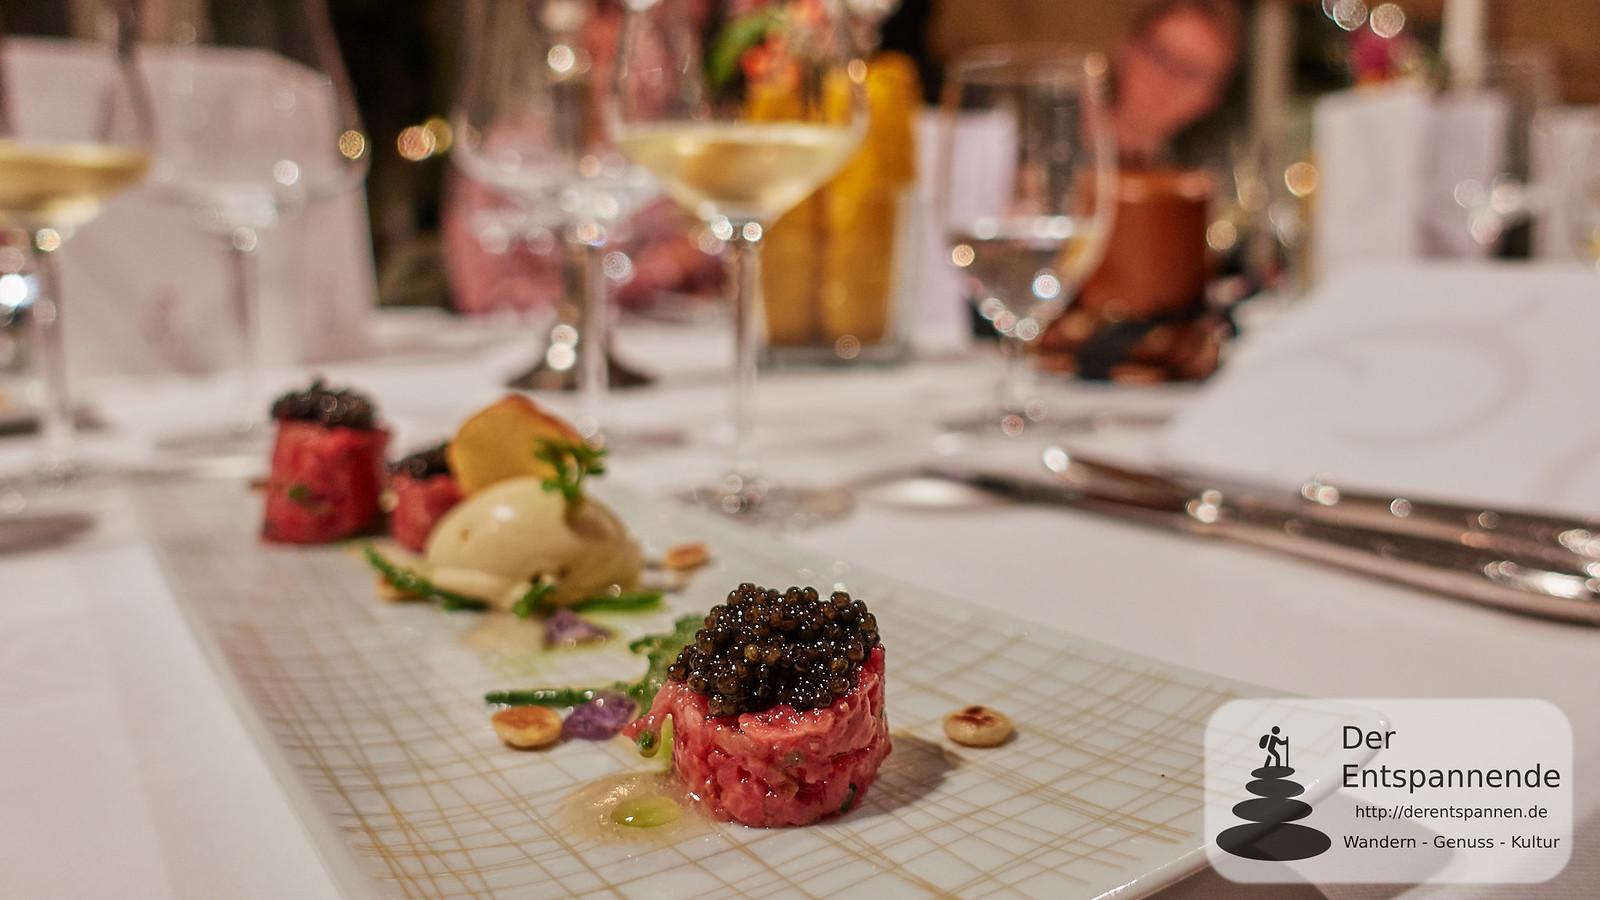 Menü im Restaurant Erbprinz: Rindertartar mit Saint James Kaviar, Senfeis, Passepierresalat